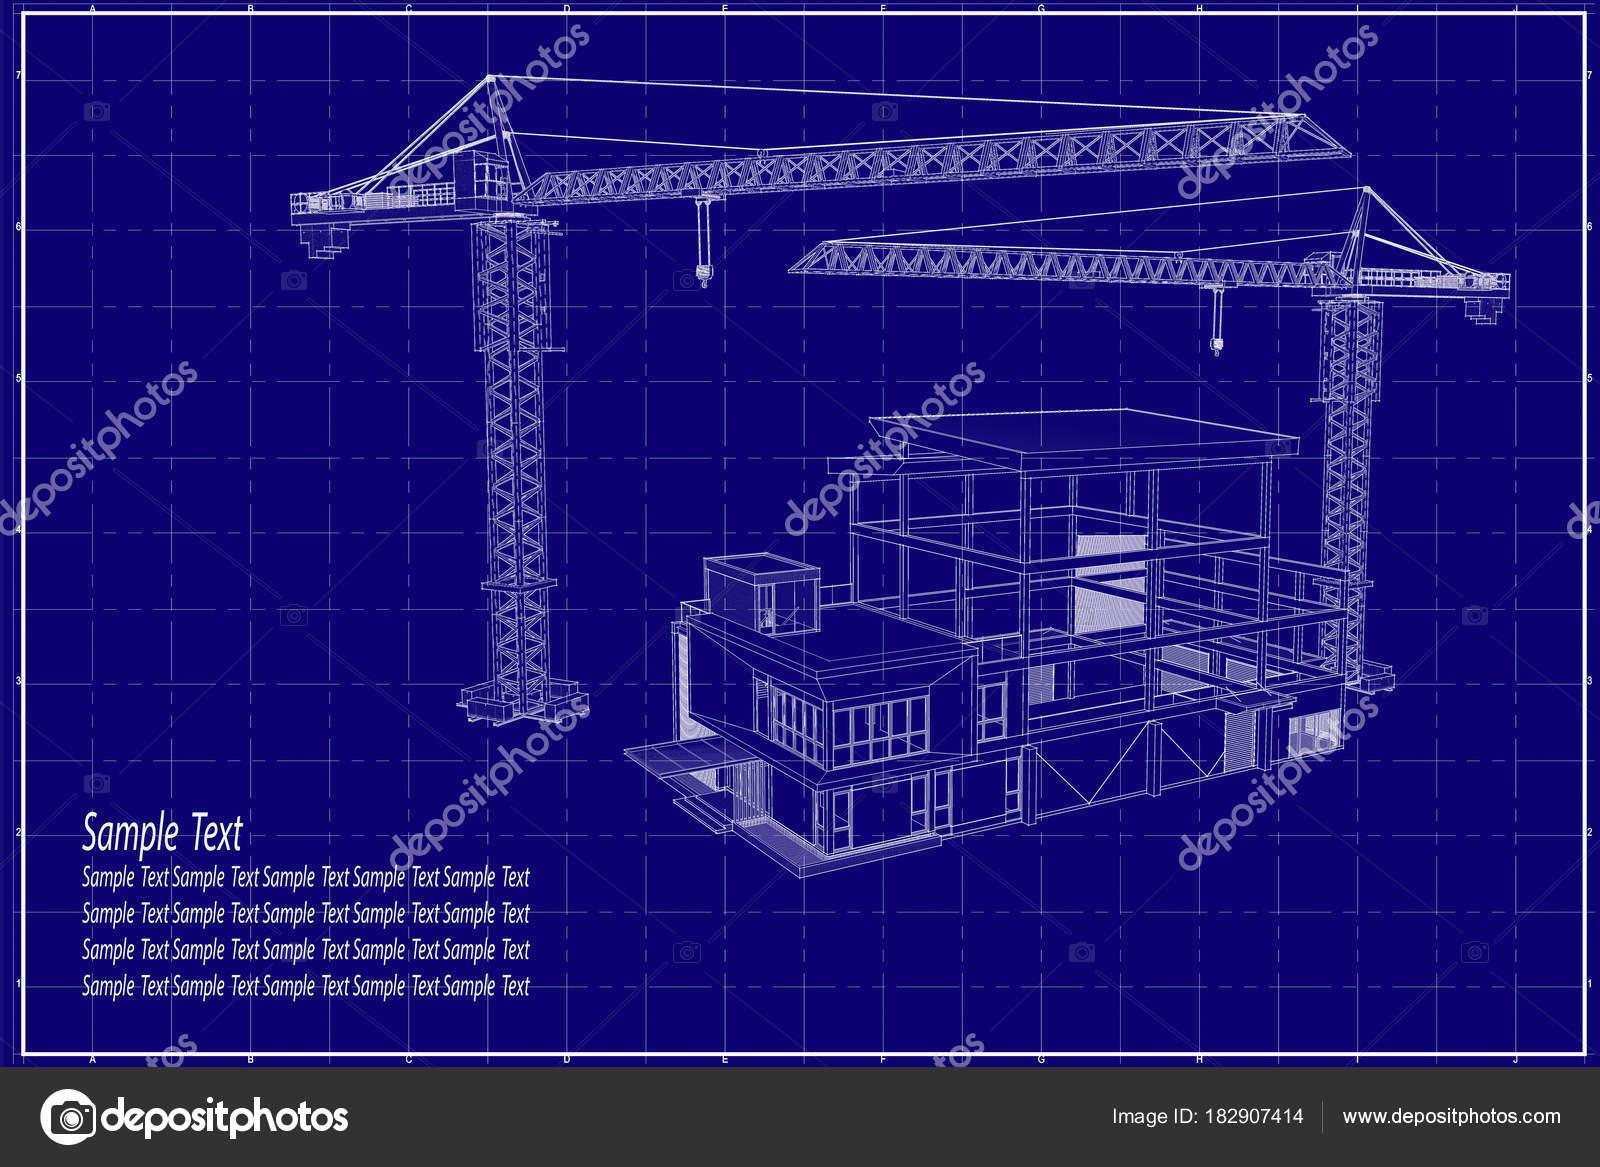 3d building on blueprint stock photo lookaod 182907414 3d building on blueprint stock photo malvernweather Choice Image